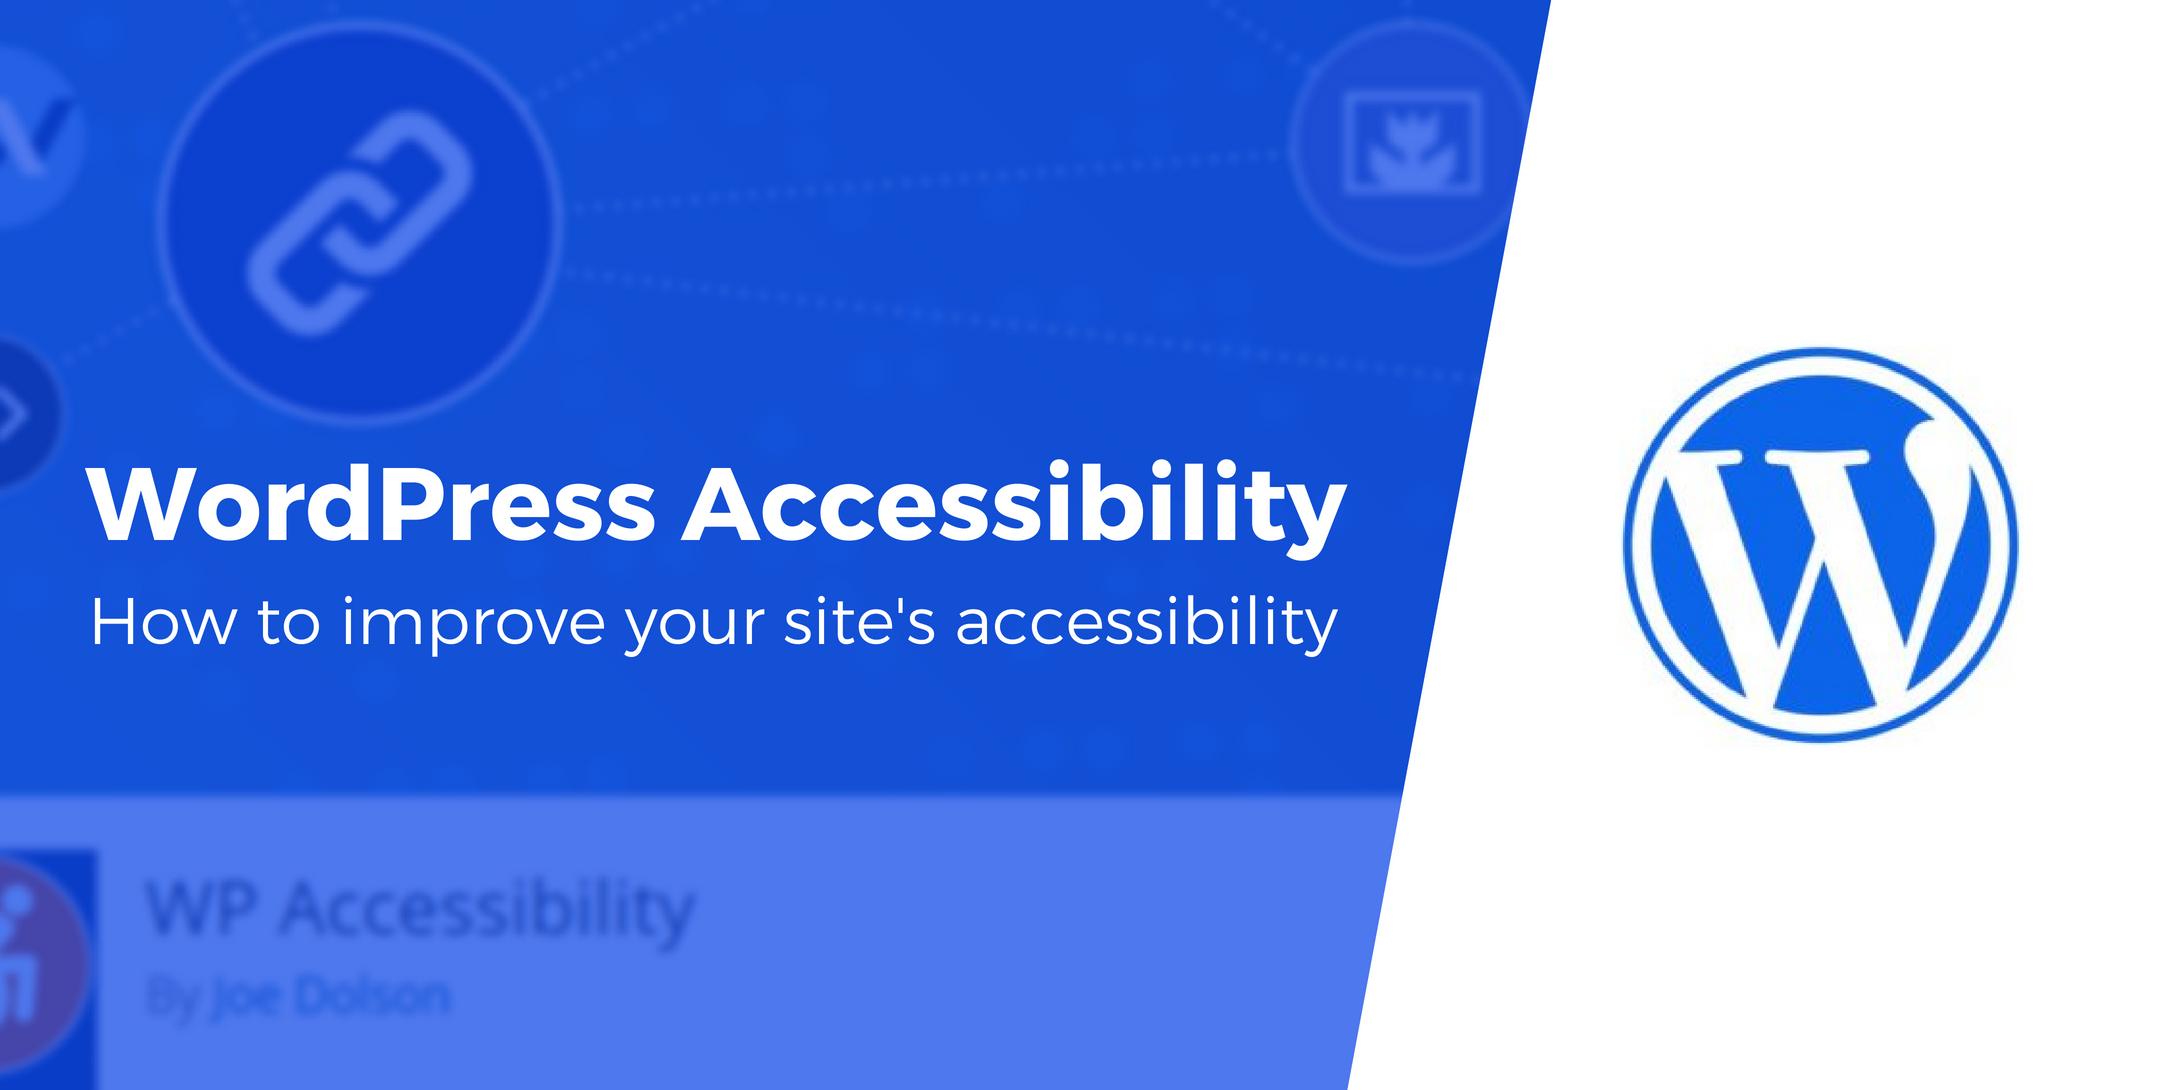 WordPress Accessibility